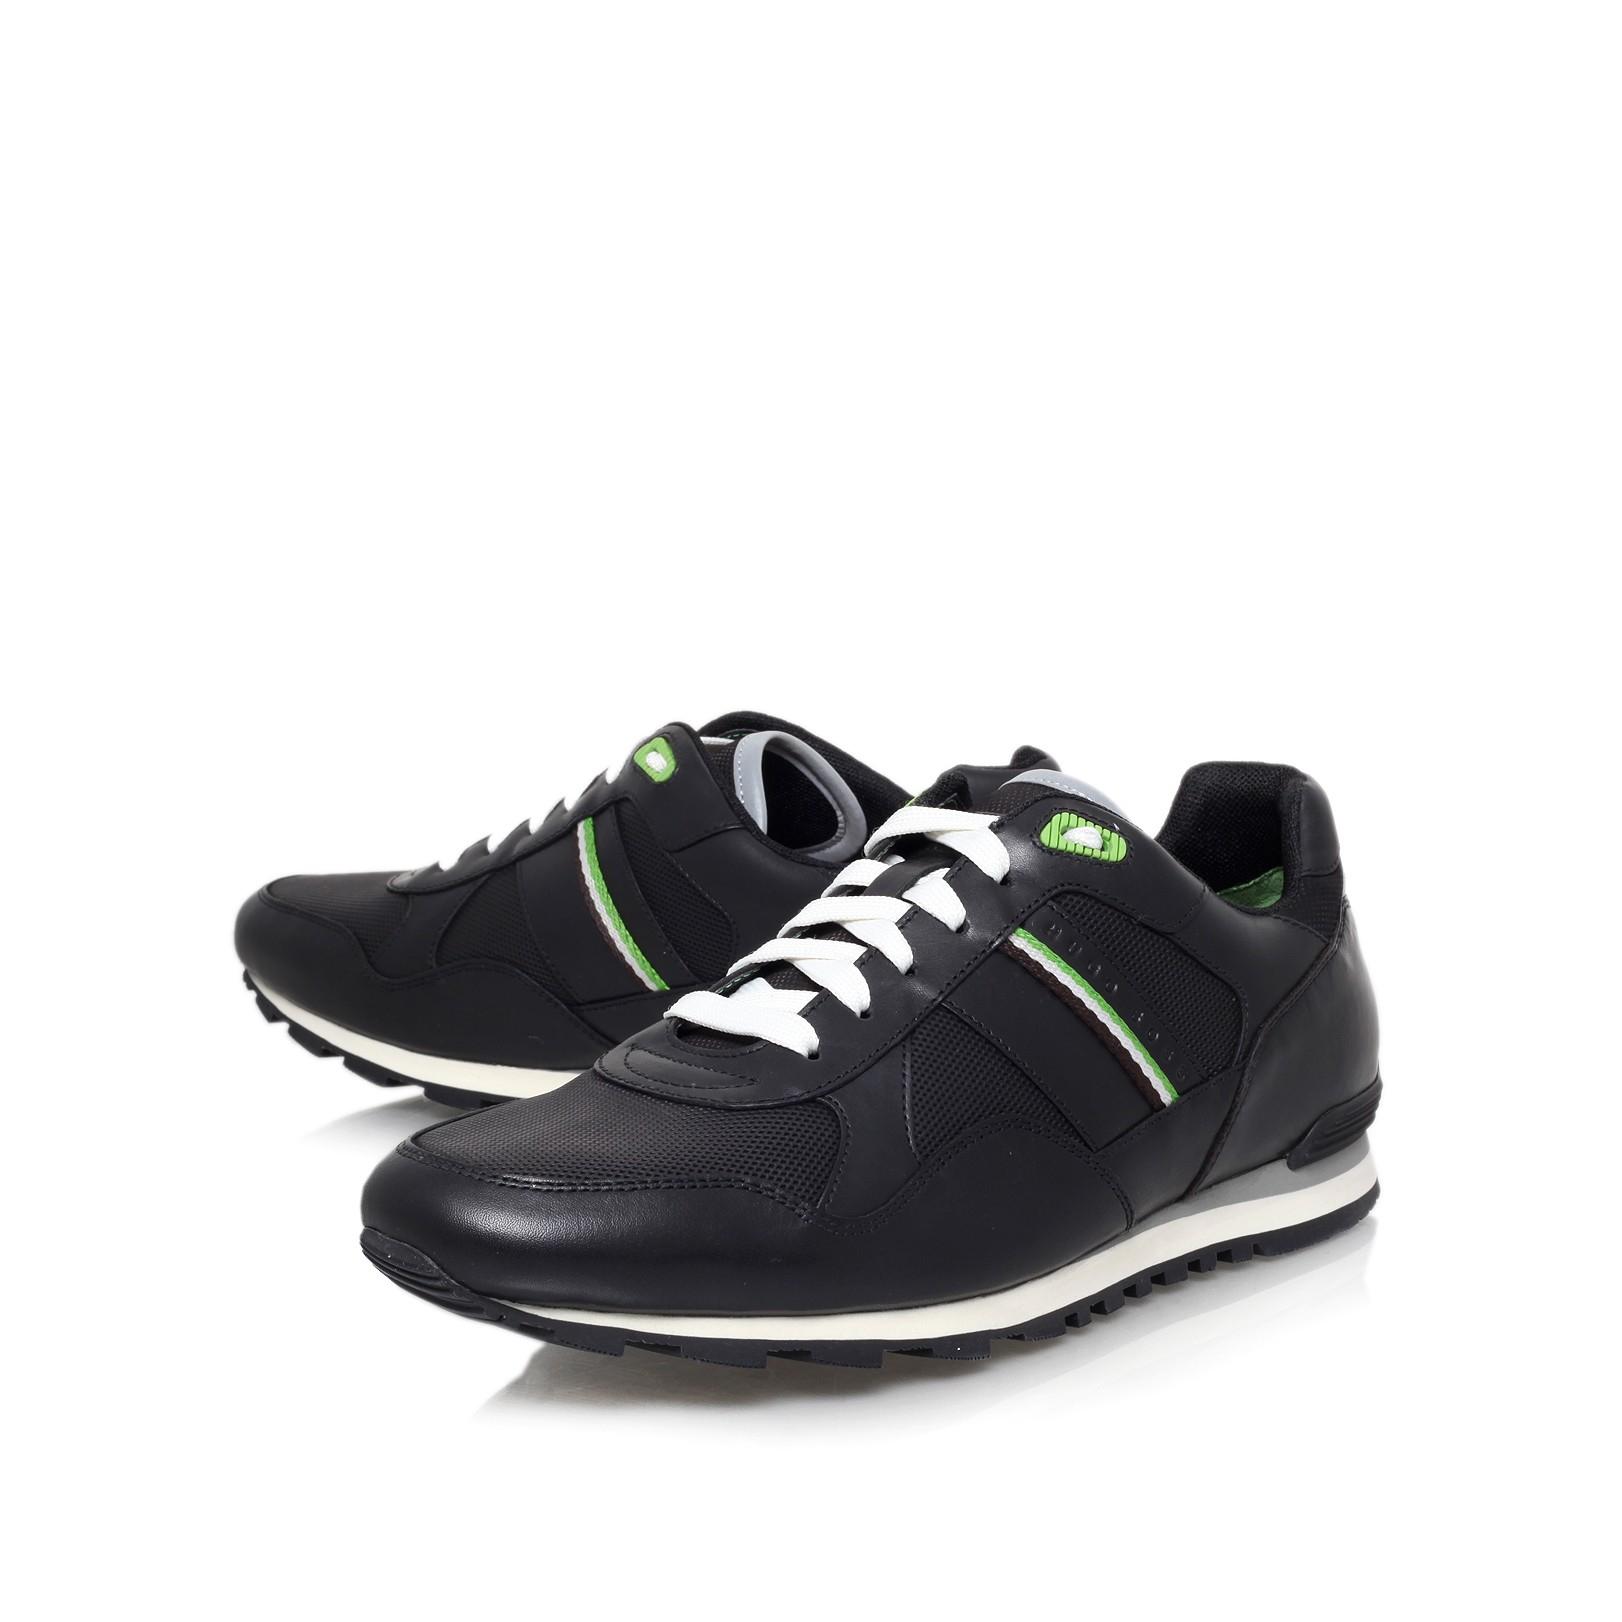 Hugo Boss Run Cool Shoes